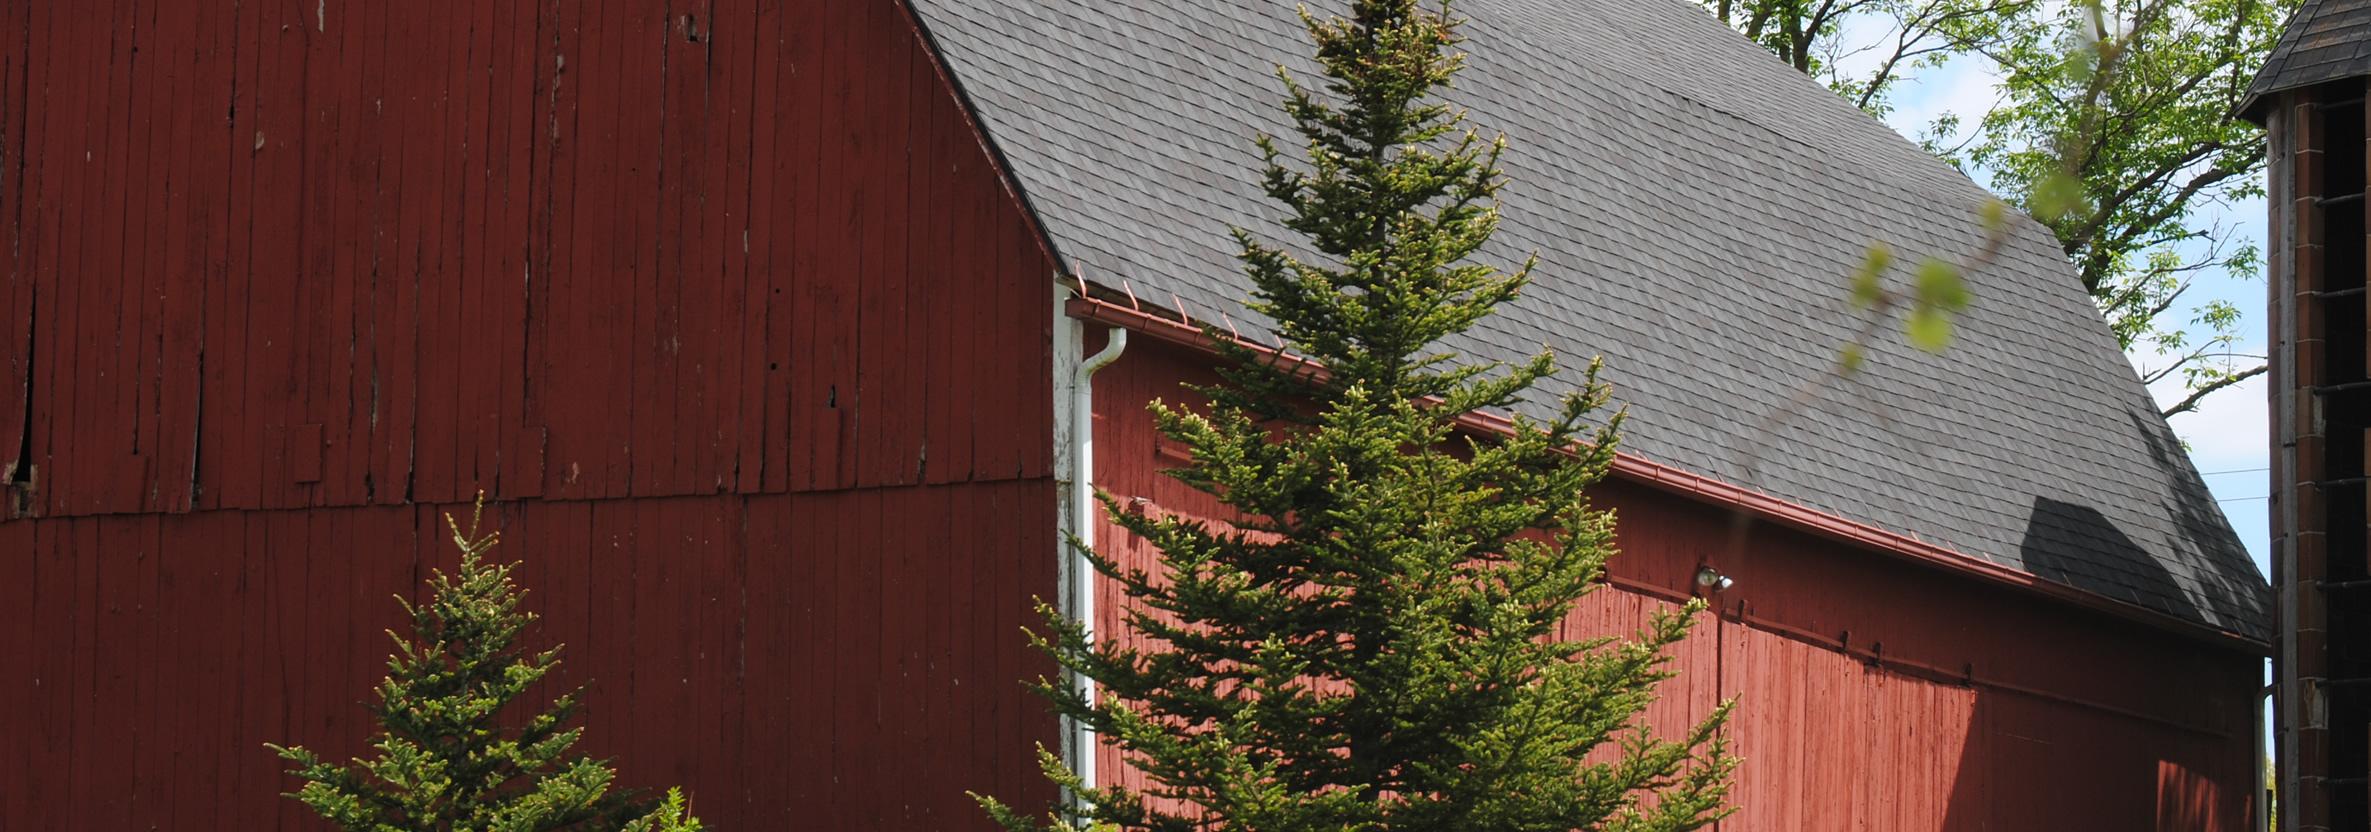 Michigan oakland county highland -  Highland Township Red Barn Jpg